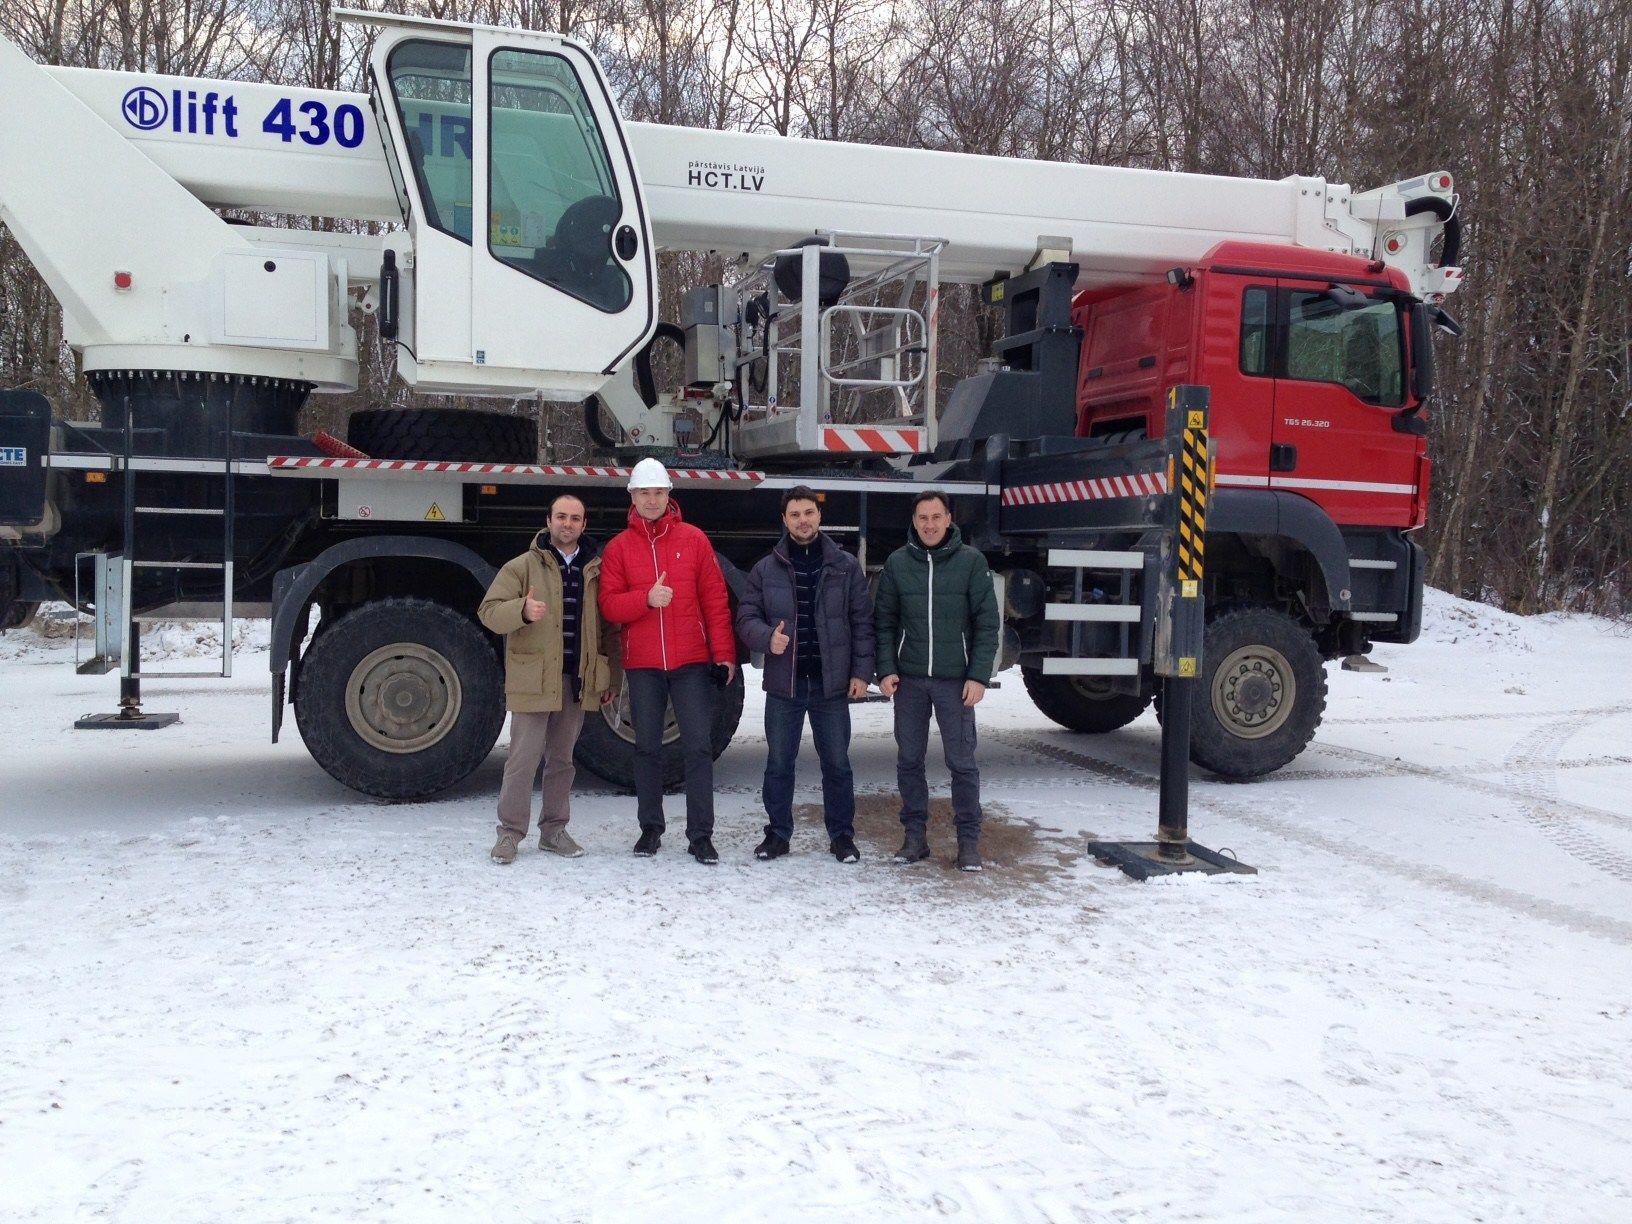 da sinistra, Davide Pulito (CTE area manager), Aleksandr Zahharov (Eesti Energia Kaevandused), Aleksandrs Urbanovics (HCT Automotive)  e Luca Debiasi